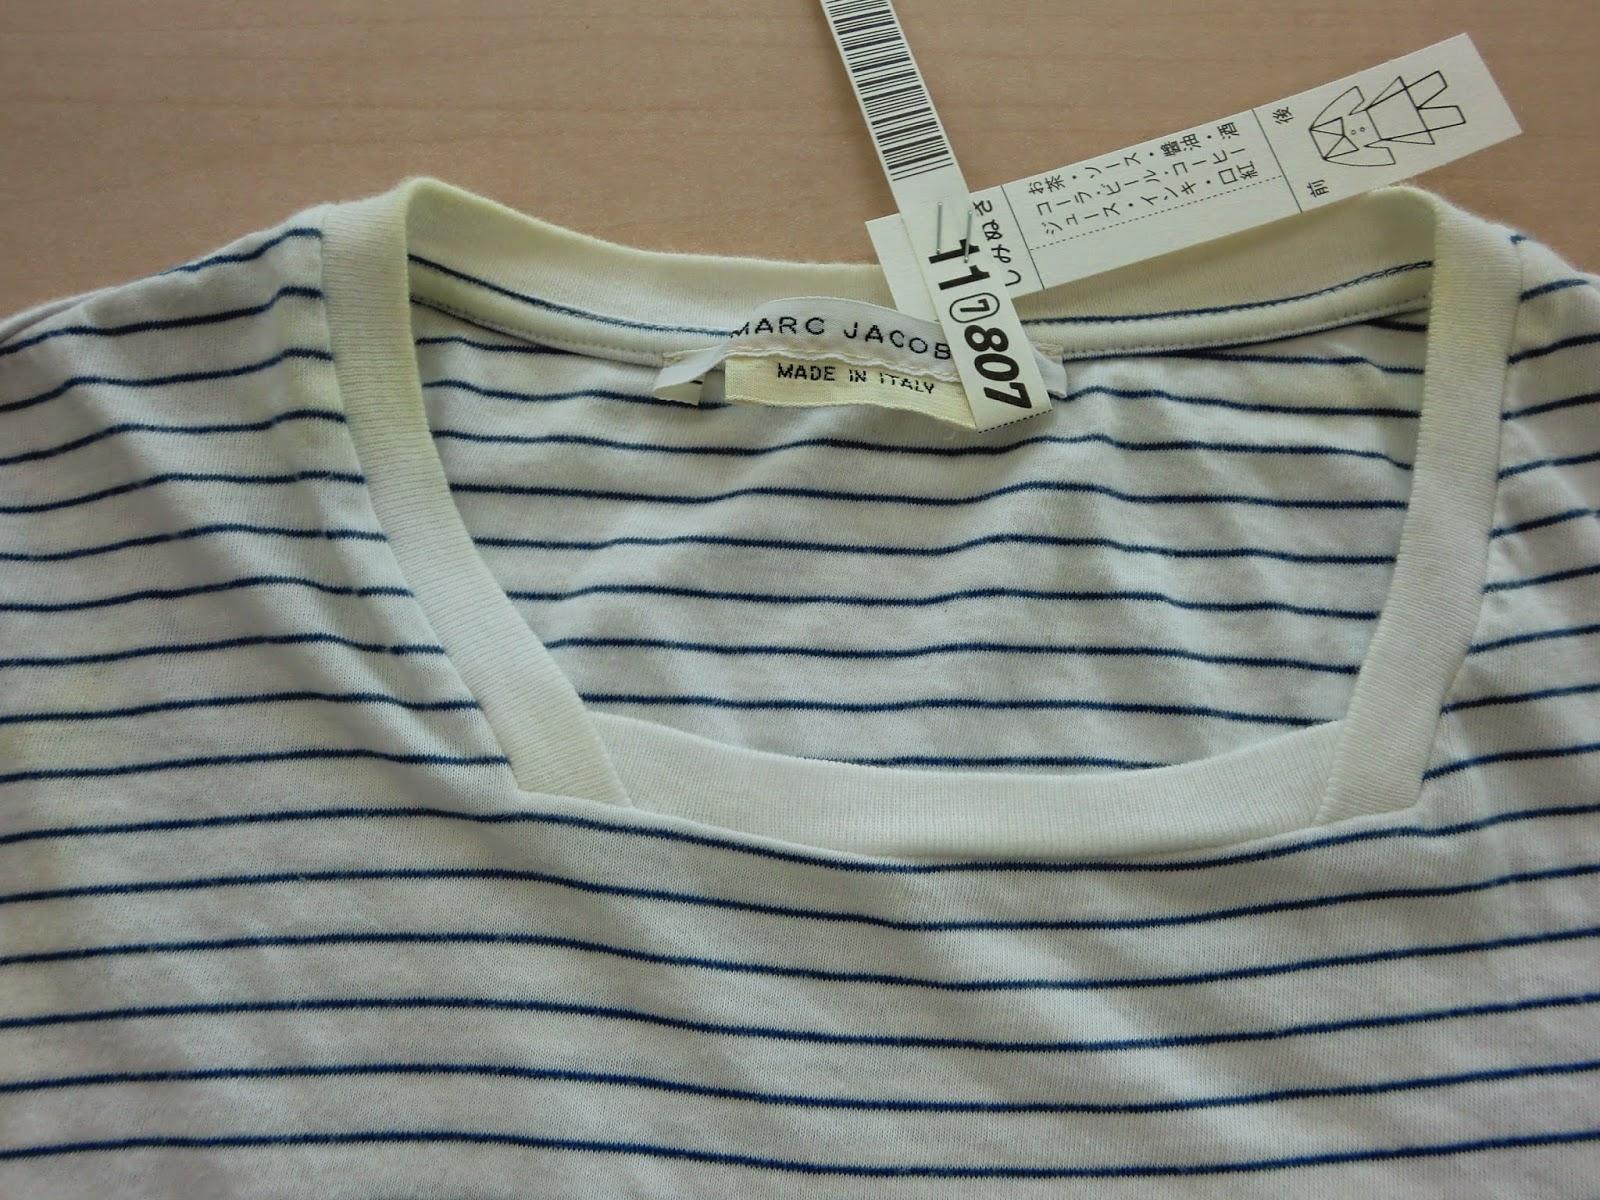 MARC JACOBS /マークジェイコブス  Tシャツしみぬき写真金沢市でブランド衣類のしみ抜きクリーニングの上手い店